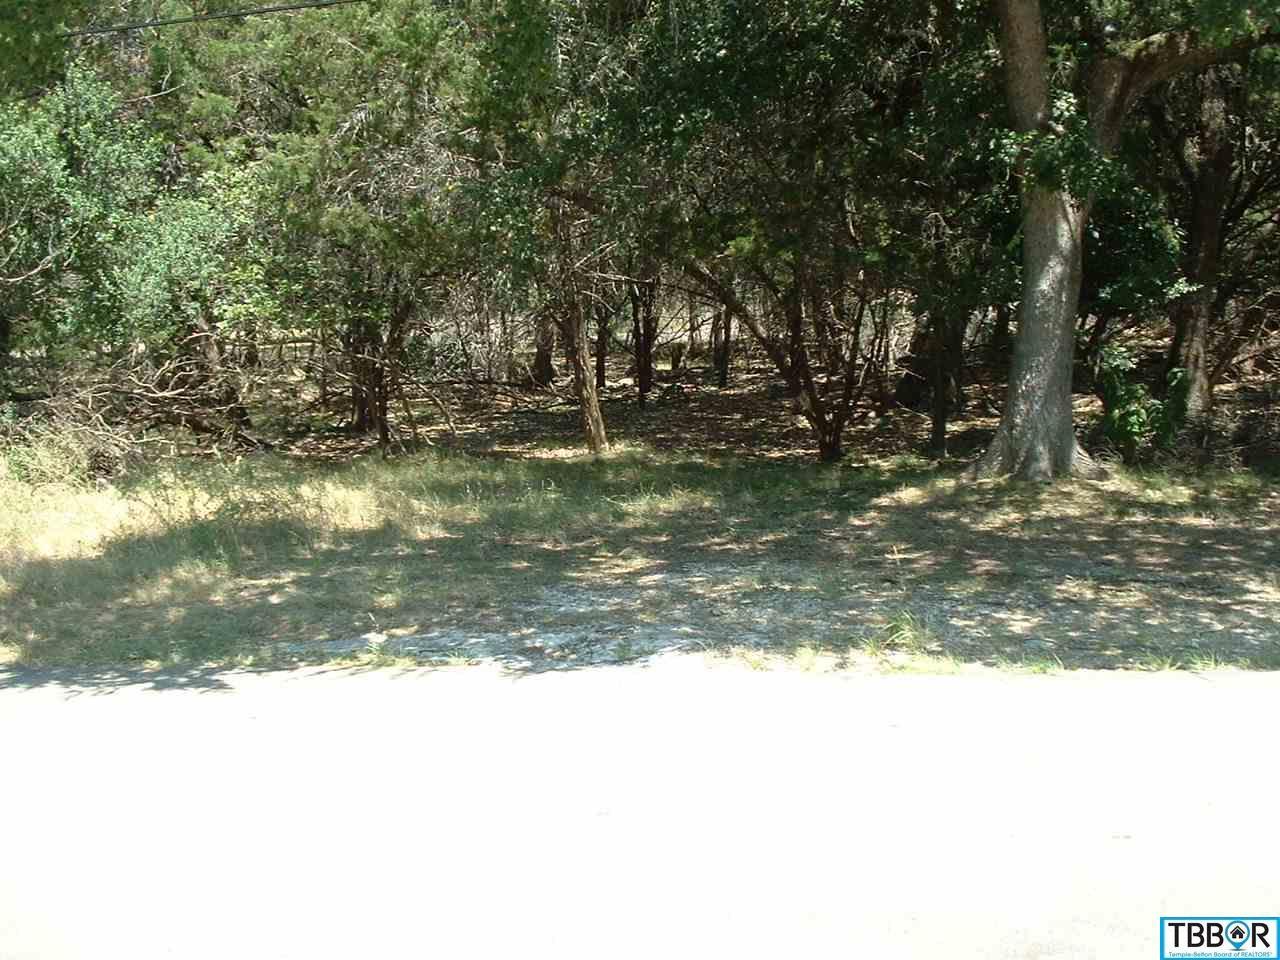 0000 Blackjack, Morgans Point TX 76513 - Photo 1